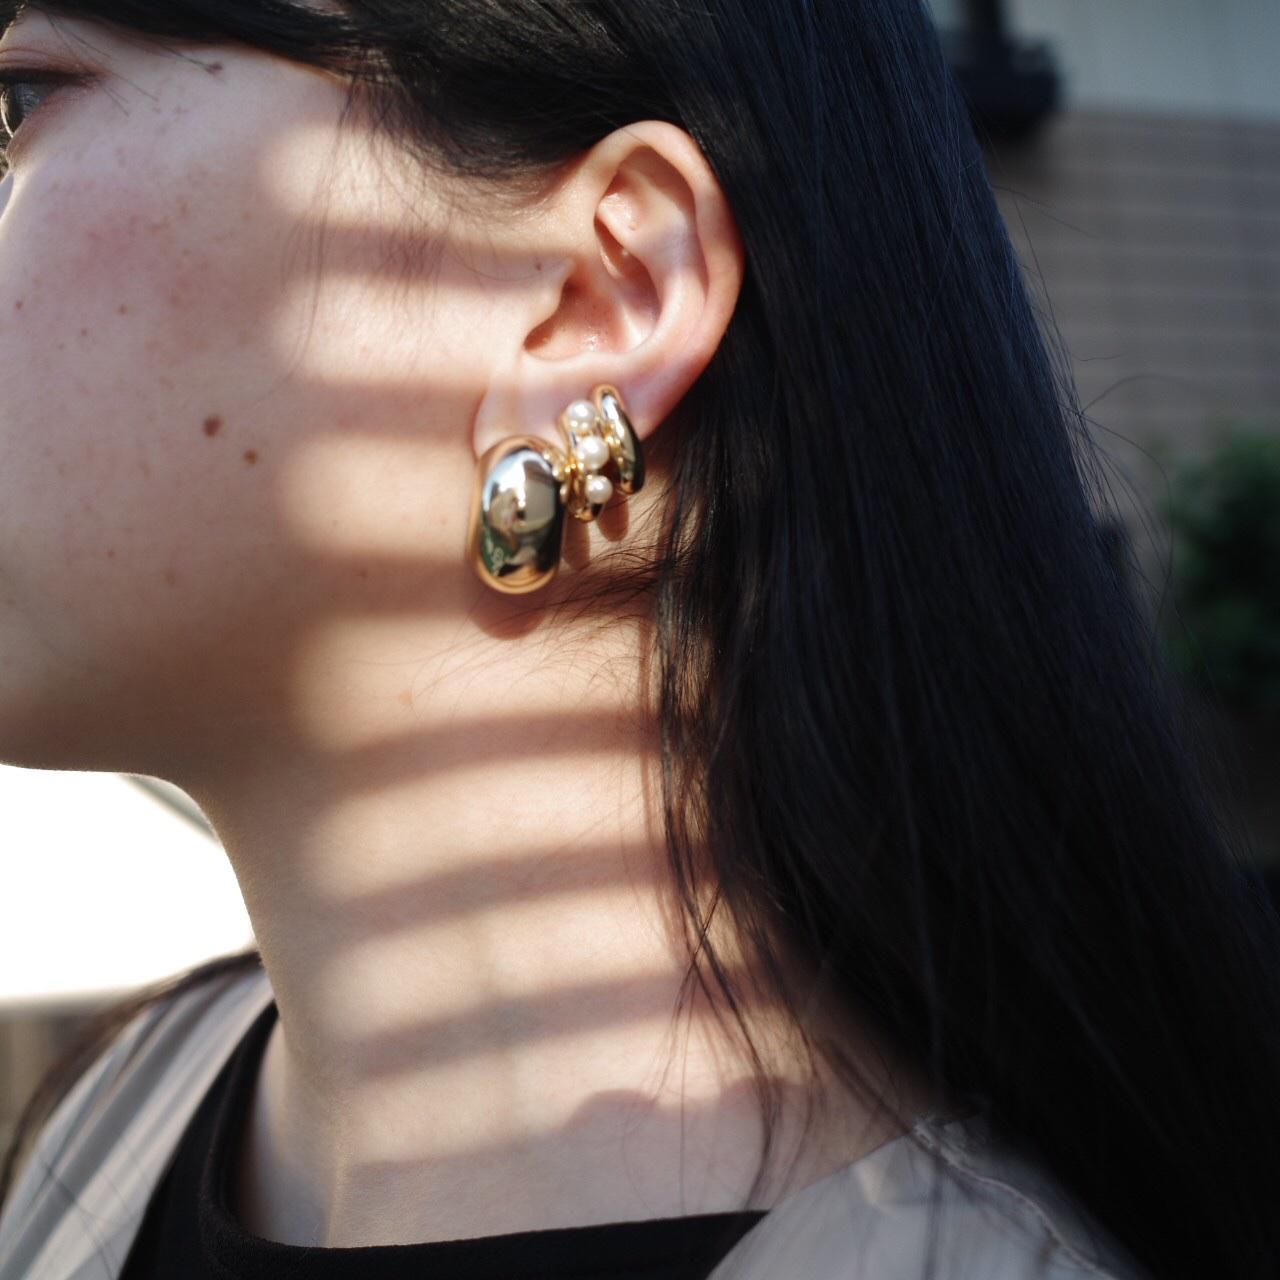 macaroni hoop pierce/earring